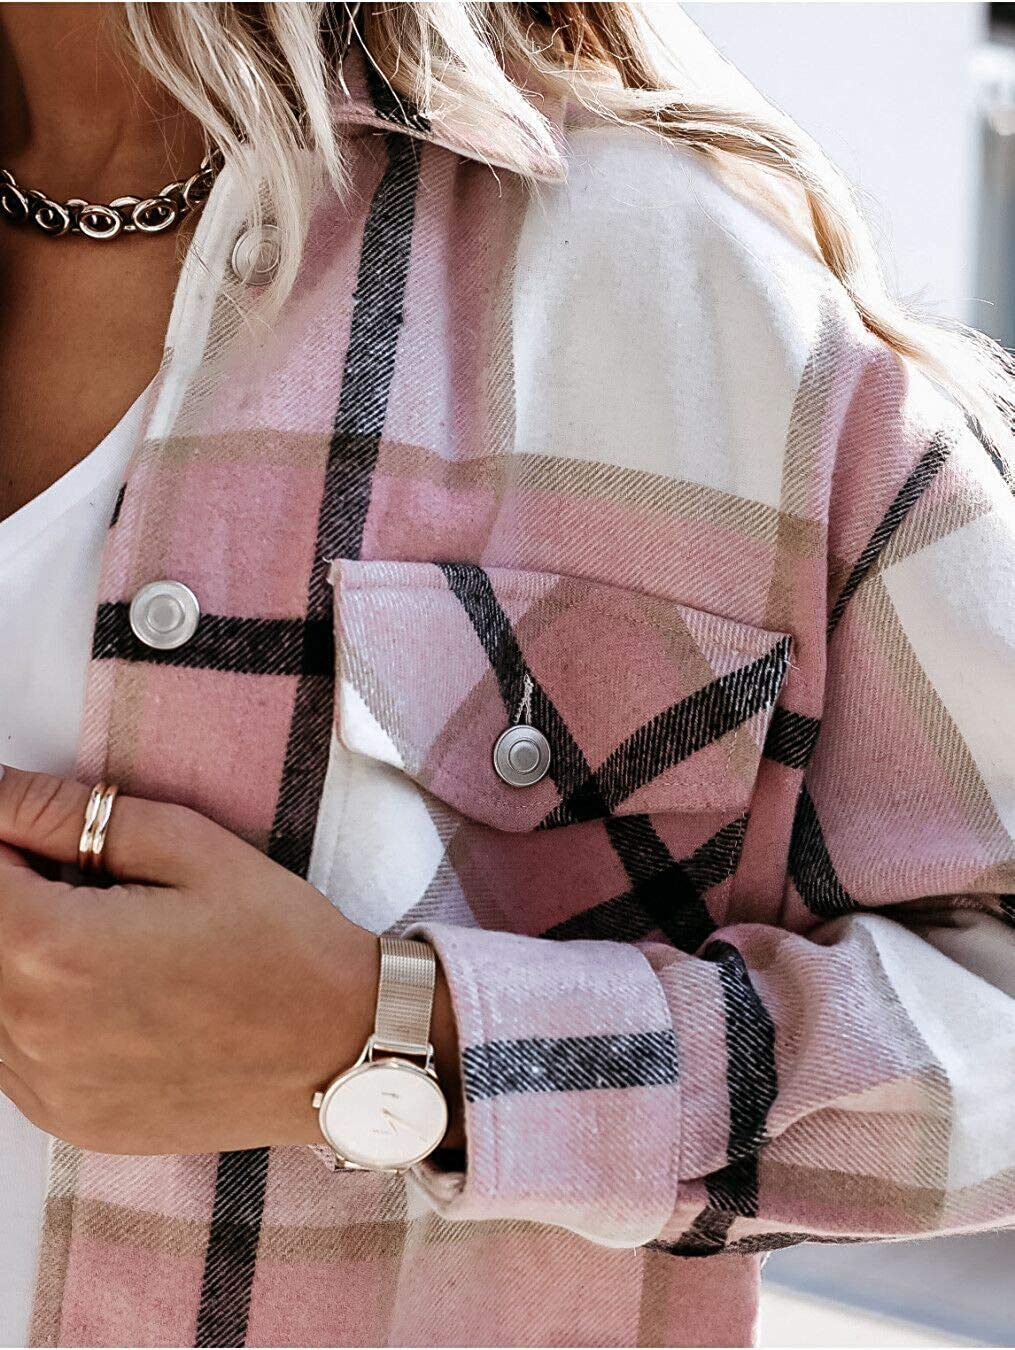 Women's Fashion Block Plaid Shirt Jacket Coat Casual Long Sleeve Loose Coat Lapel Outwear with Pocket